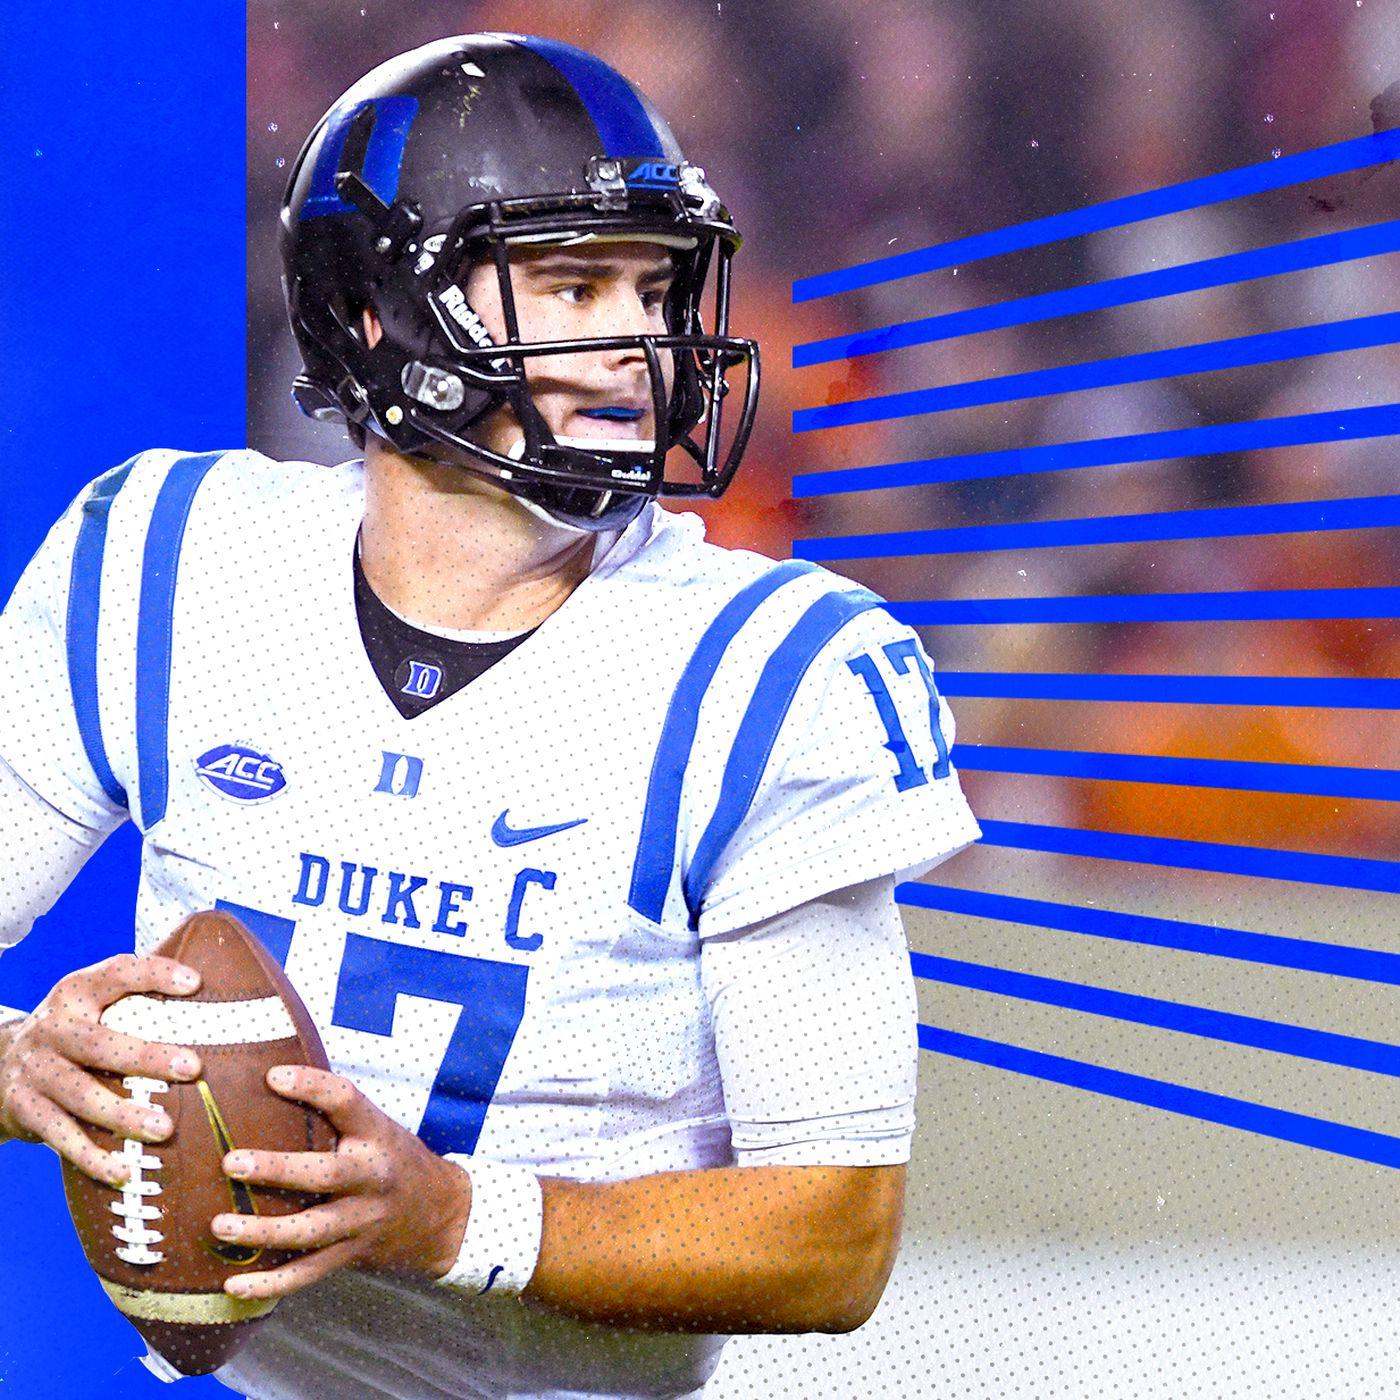 b965abcd0267 5 NFL teams that could draft Duke quarterback Daniel Jones in 1st ...